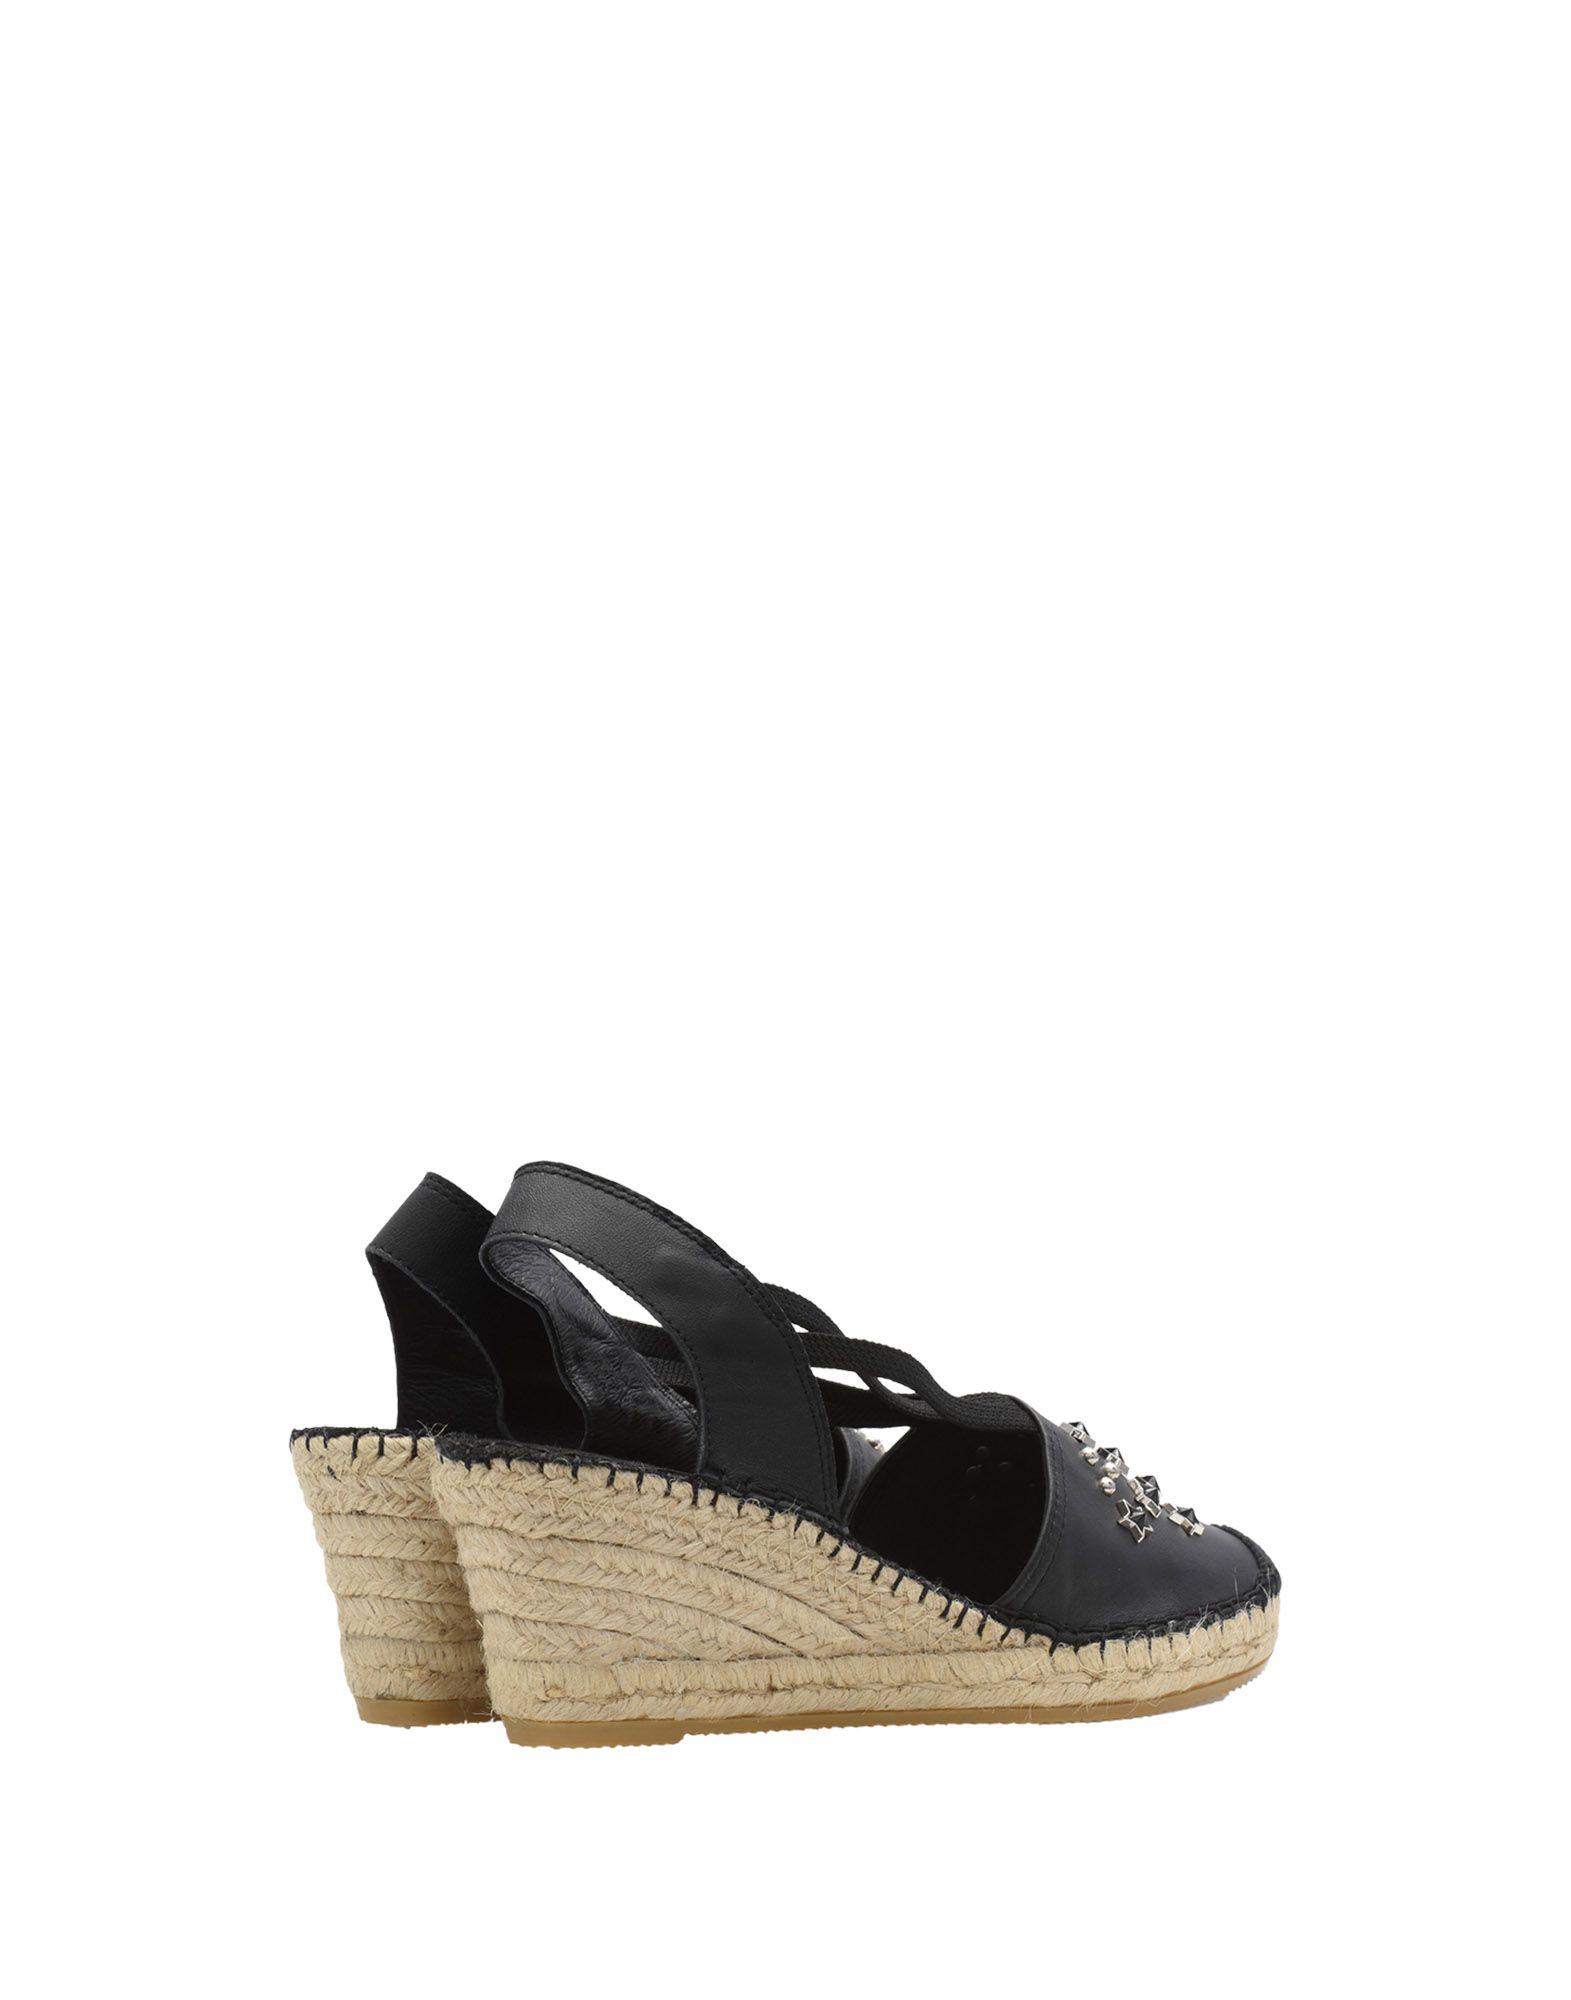 Vidorreta Gute Espadrilles Damen  11468999GL Gute Vidorreta Qualität beliebte Schuhe 5f5274